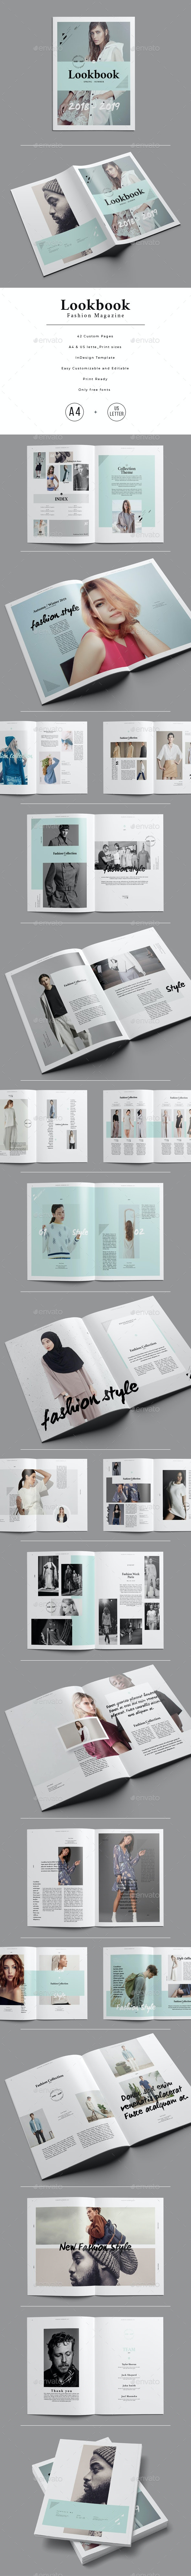 Lookbook / Fashion Magazine - Magazines Print Templates